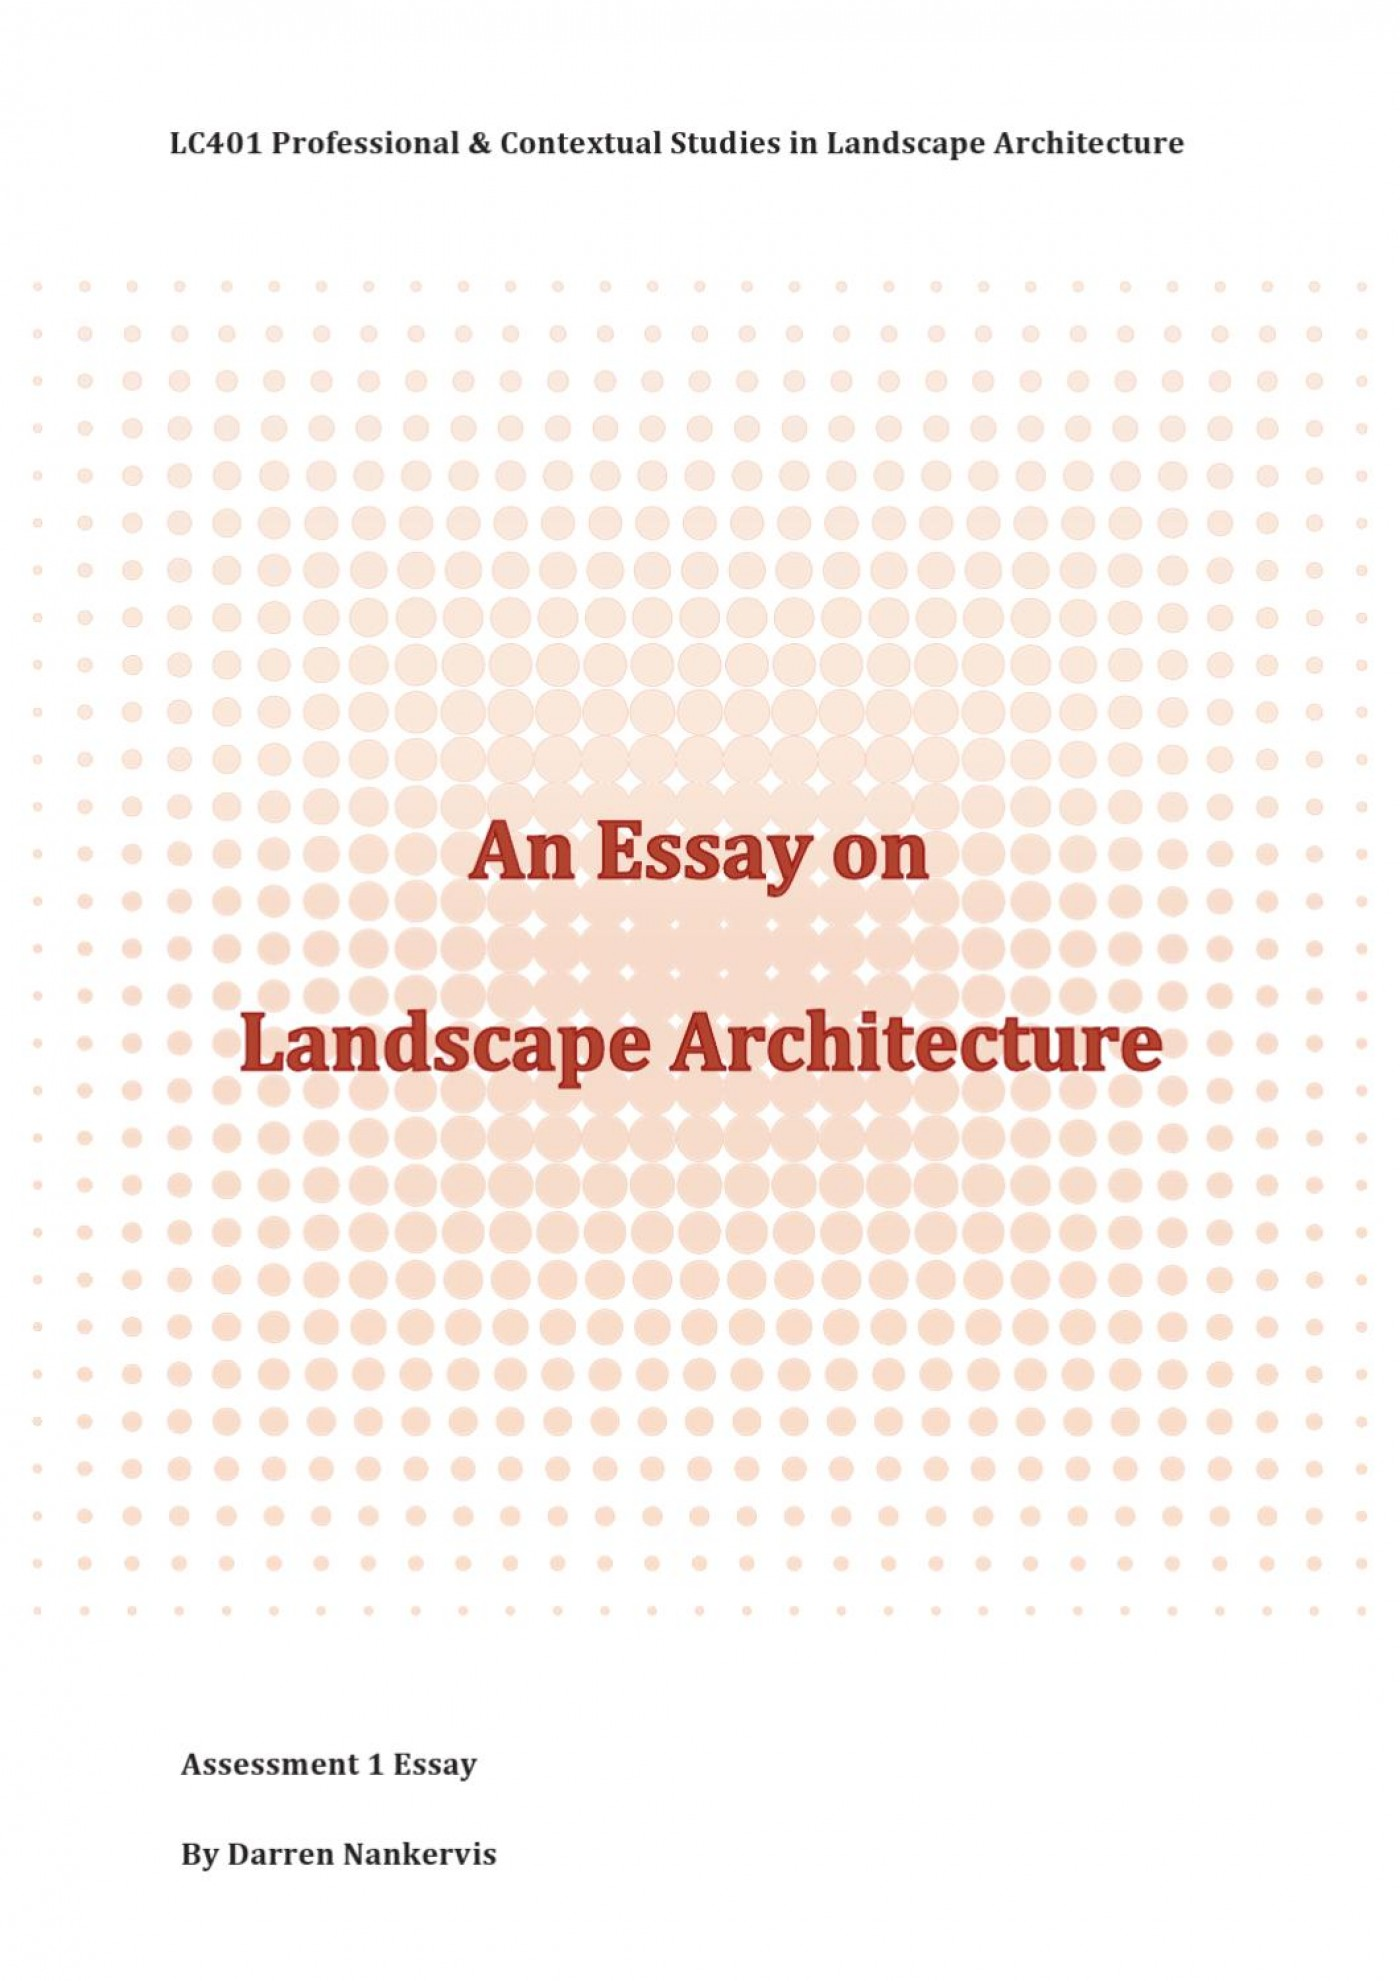 007 Landscape Architecture Essay Example Page 1 Stunning Argumentative Topics 1400